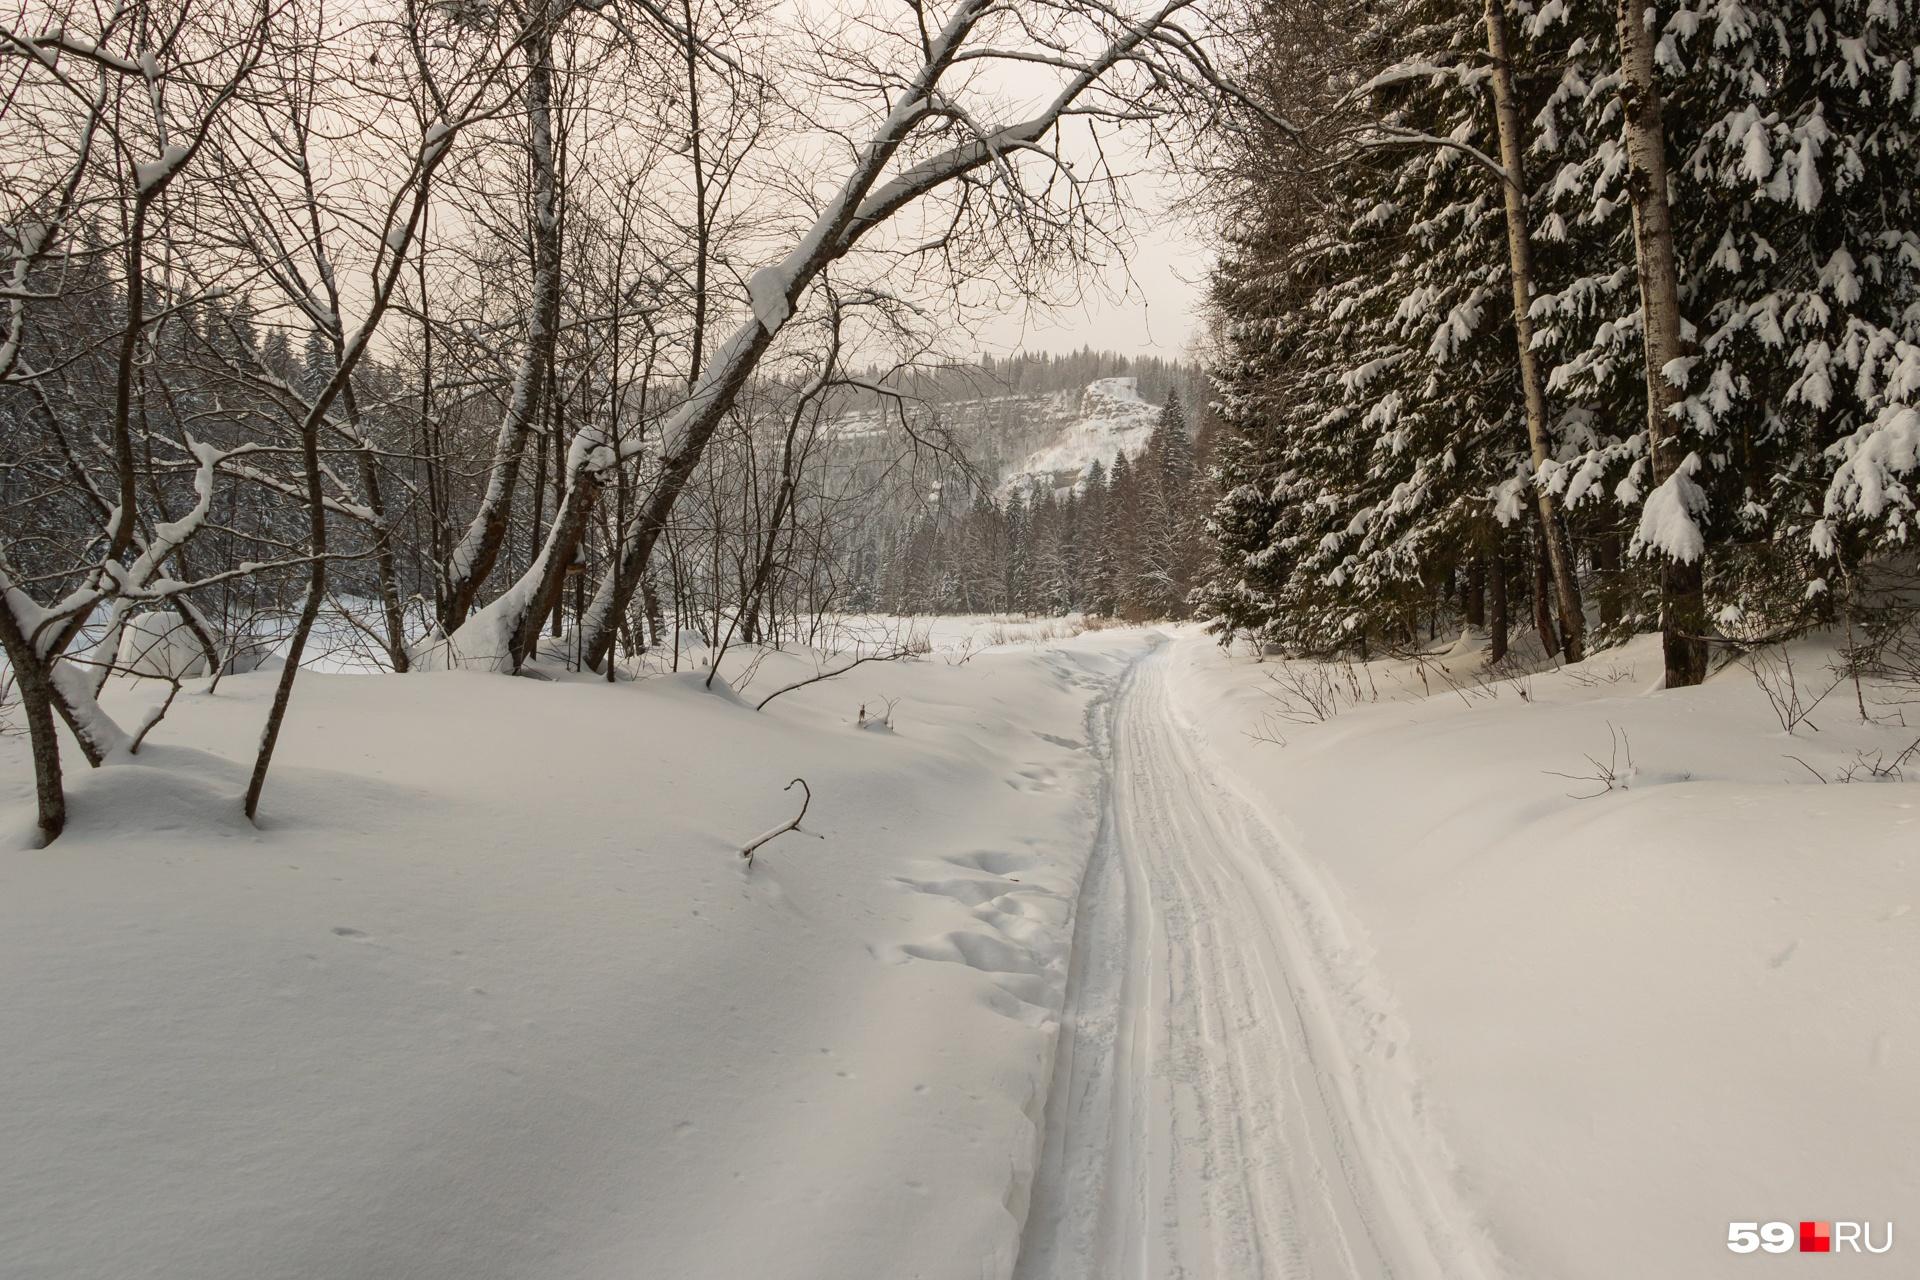 Местами дорога укатана снегоходами